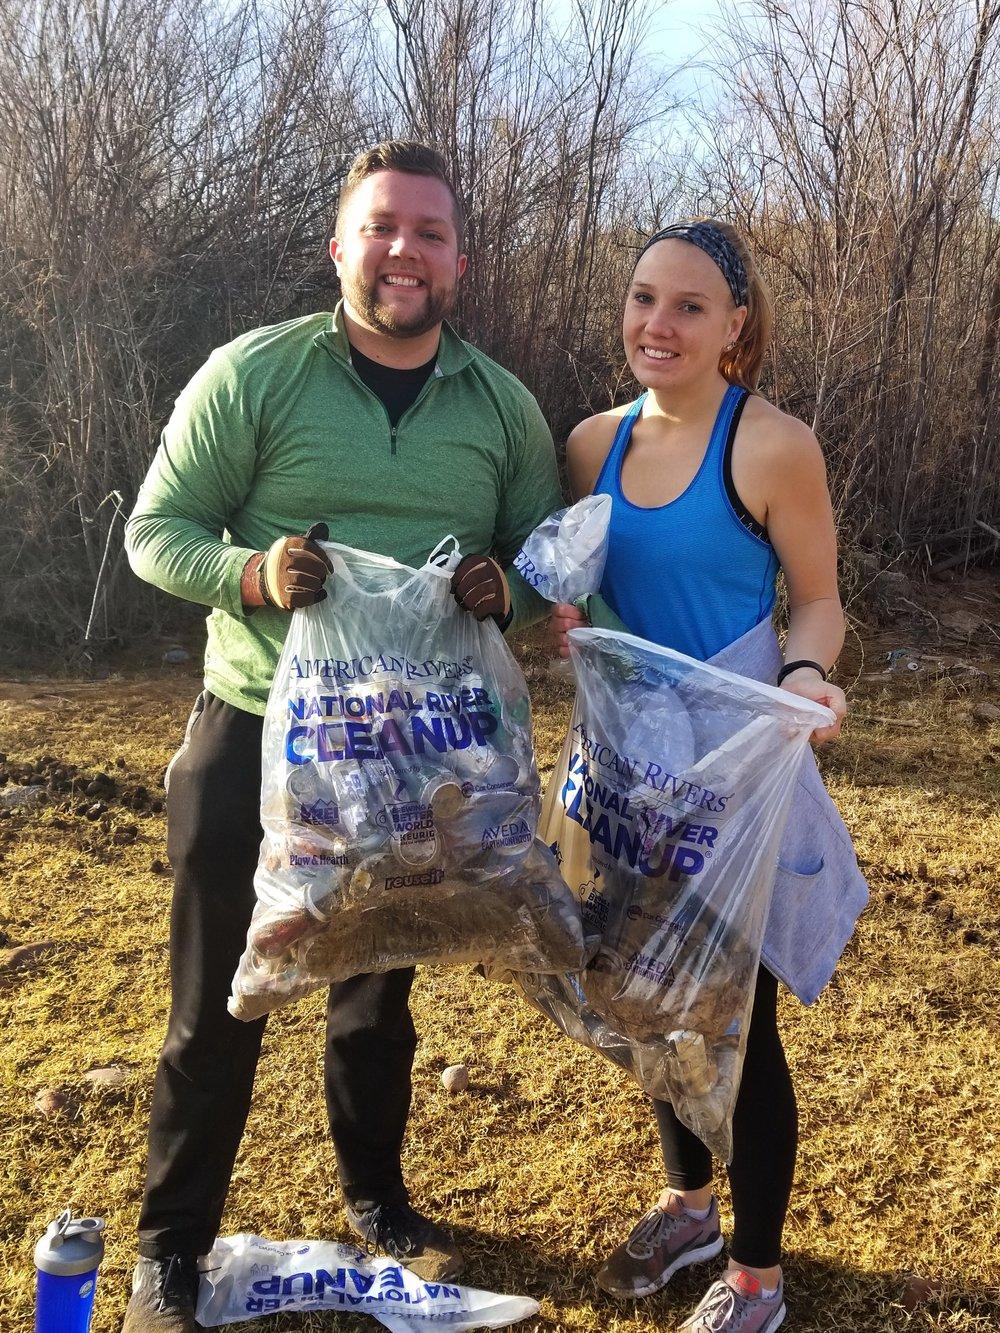 Coon Bluff NR Cleanup 2-17-18 052.jpg